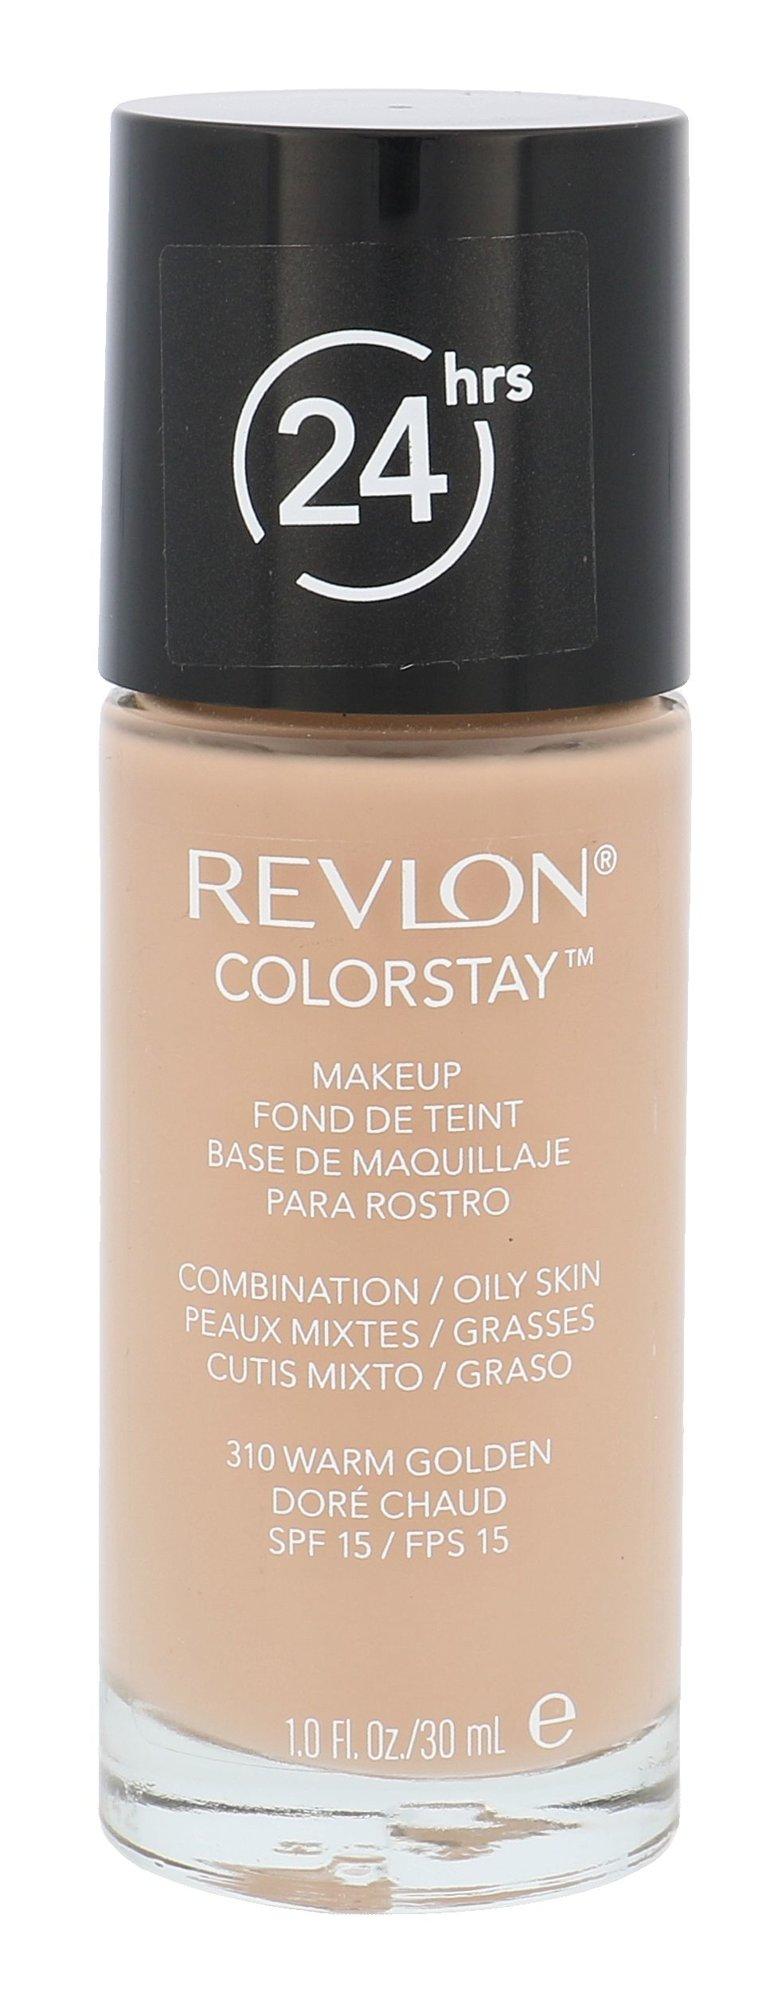 Revlon Colorstay Cosmetic 30ml 310 Warm Golden